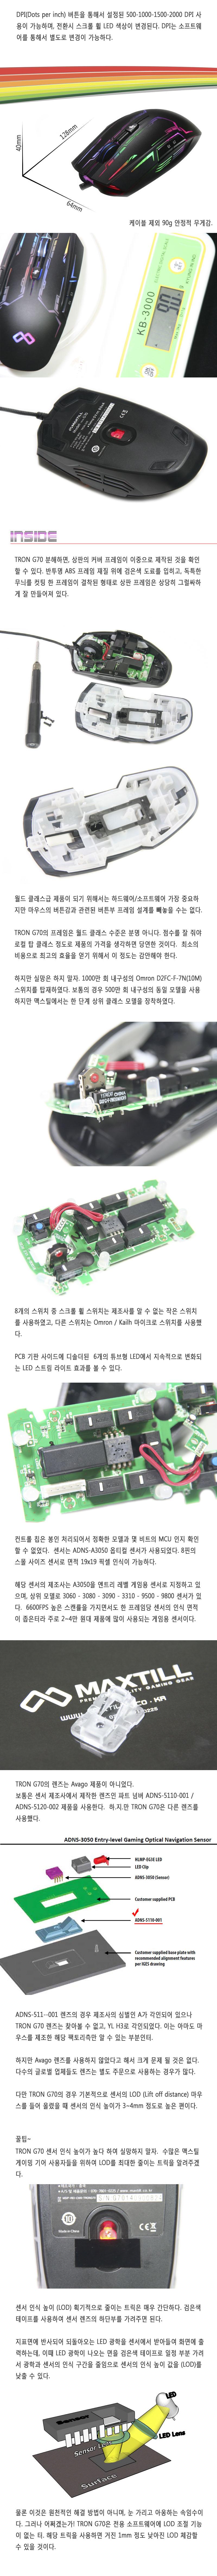 TRON G70 800 3.jpg